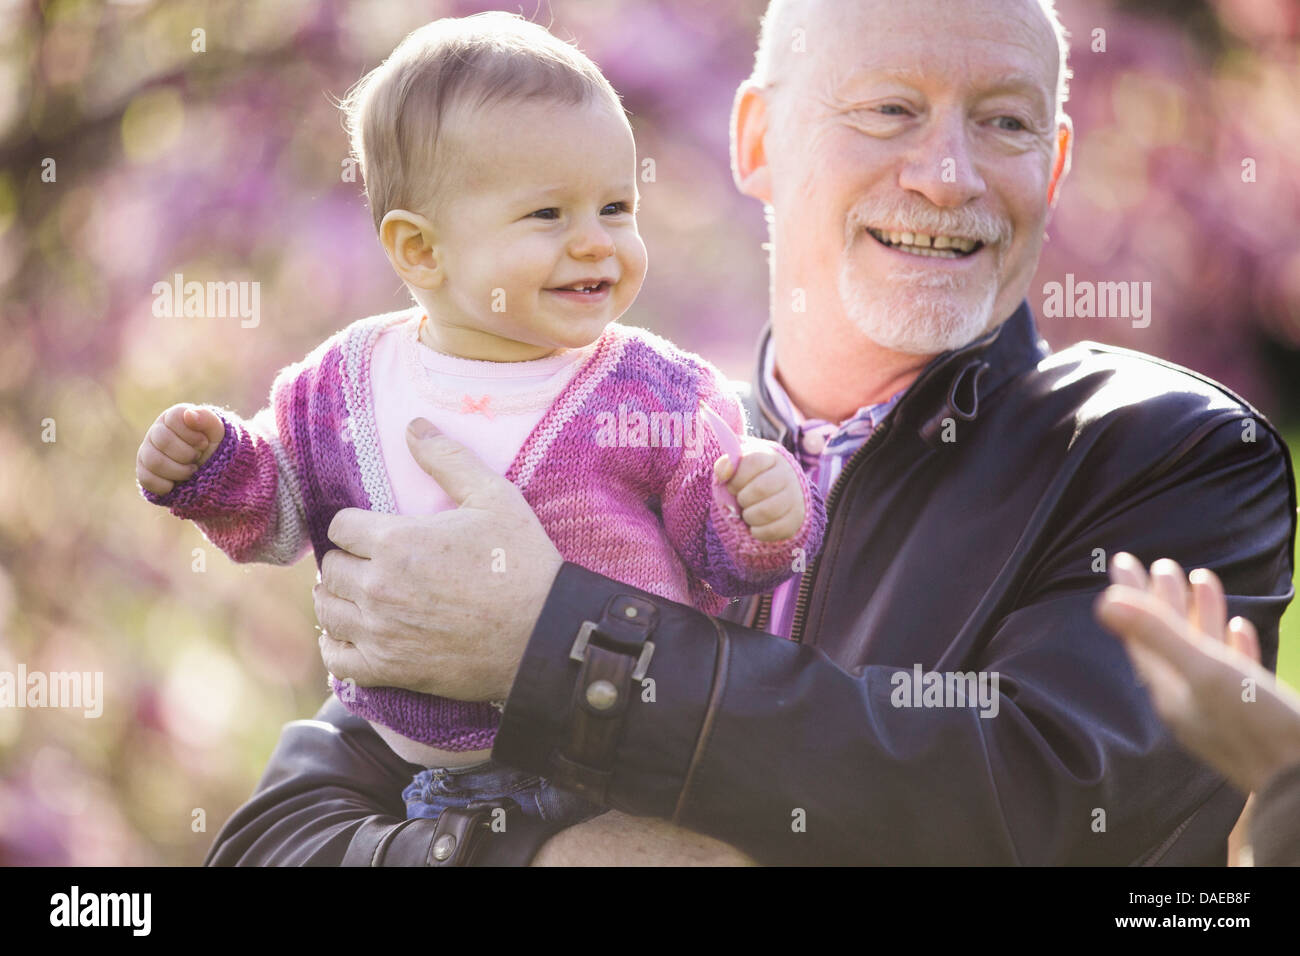 Close Up retrato de niña y abuelo Imagen De Stock